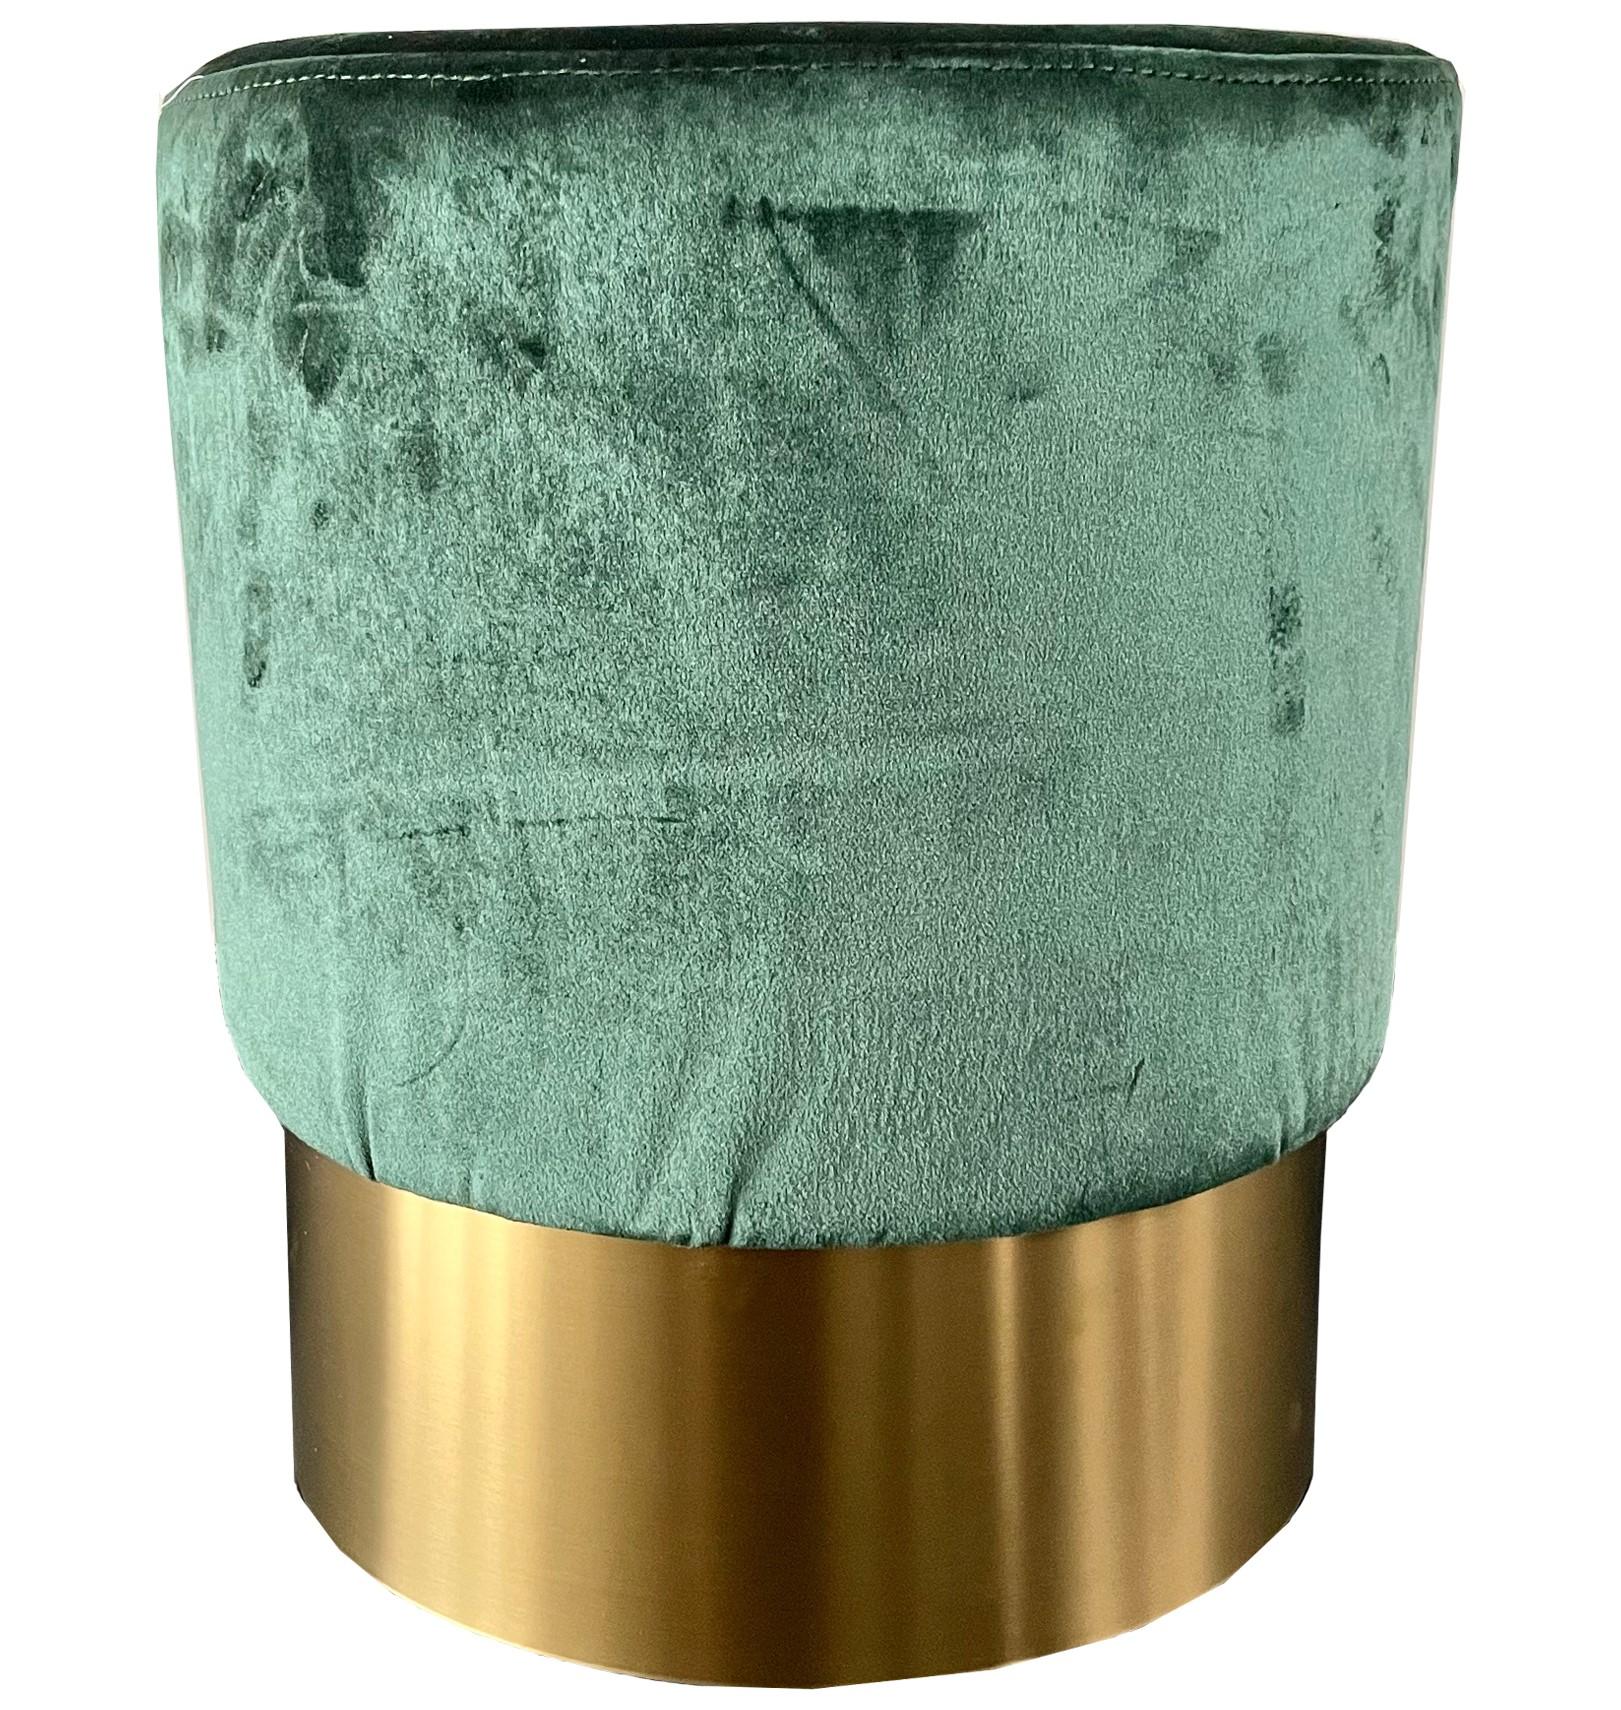 MARIAN - Poef groen 36x36x44 cm